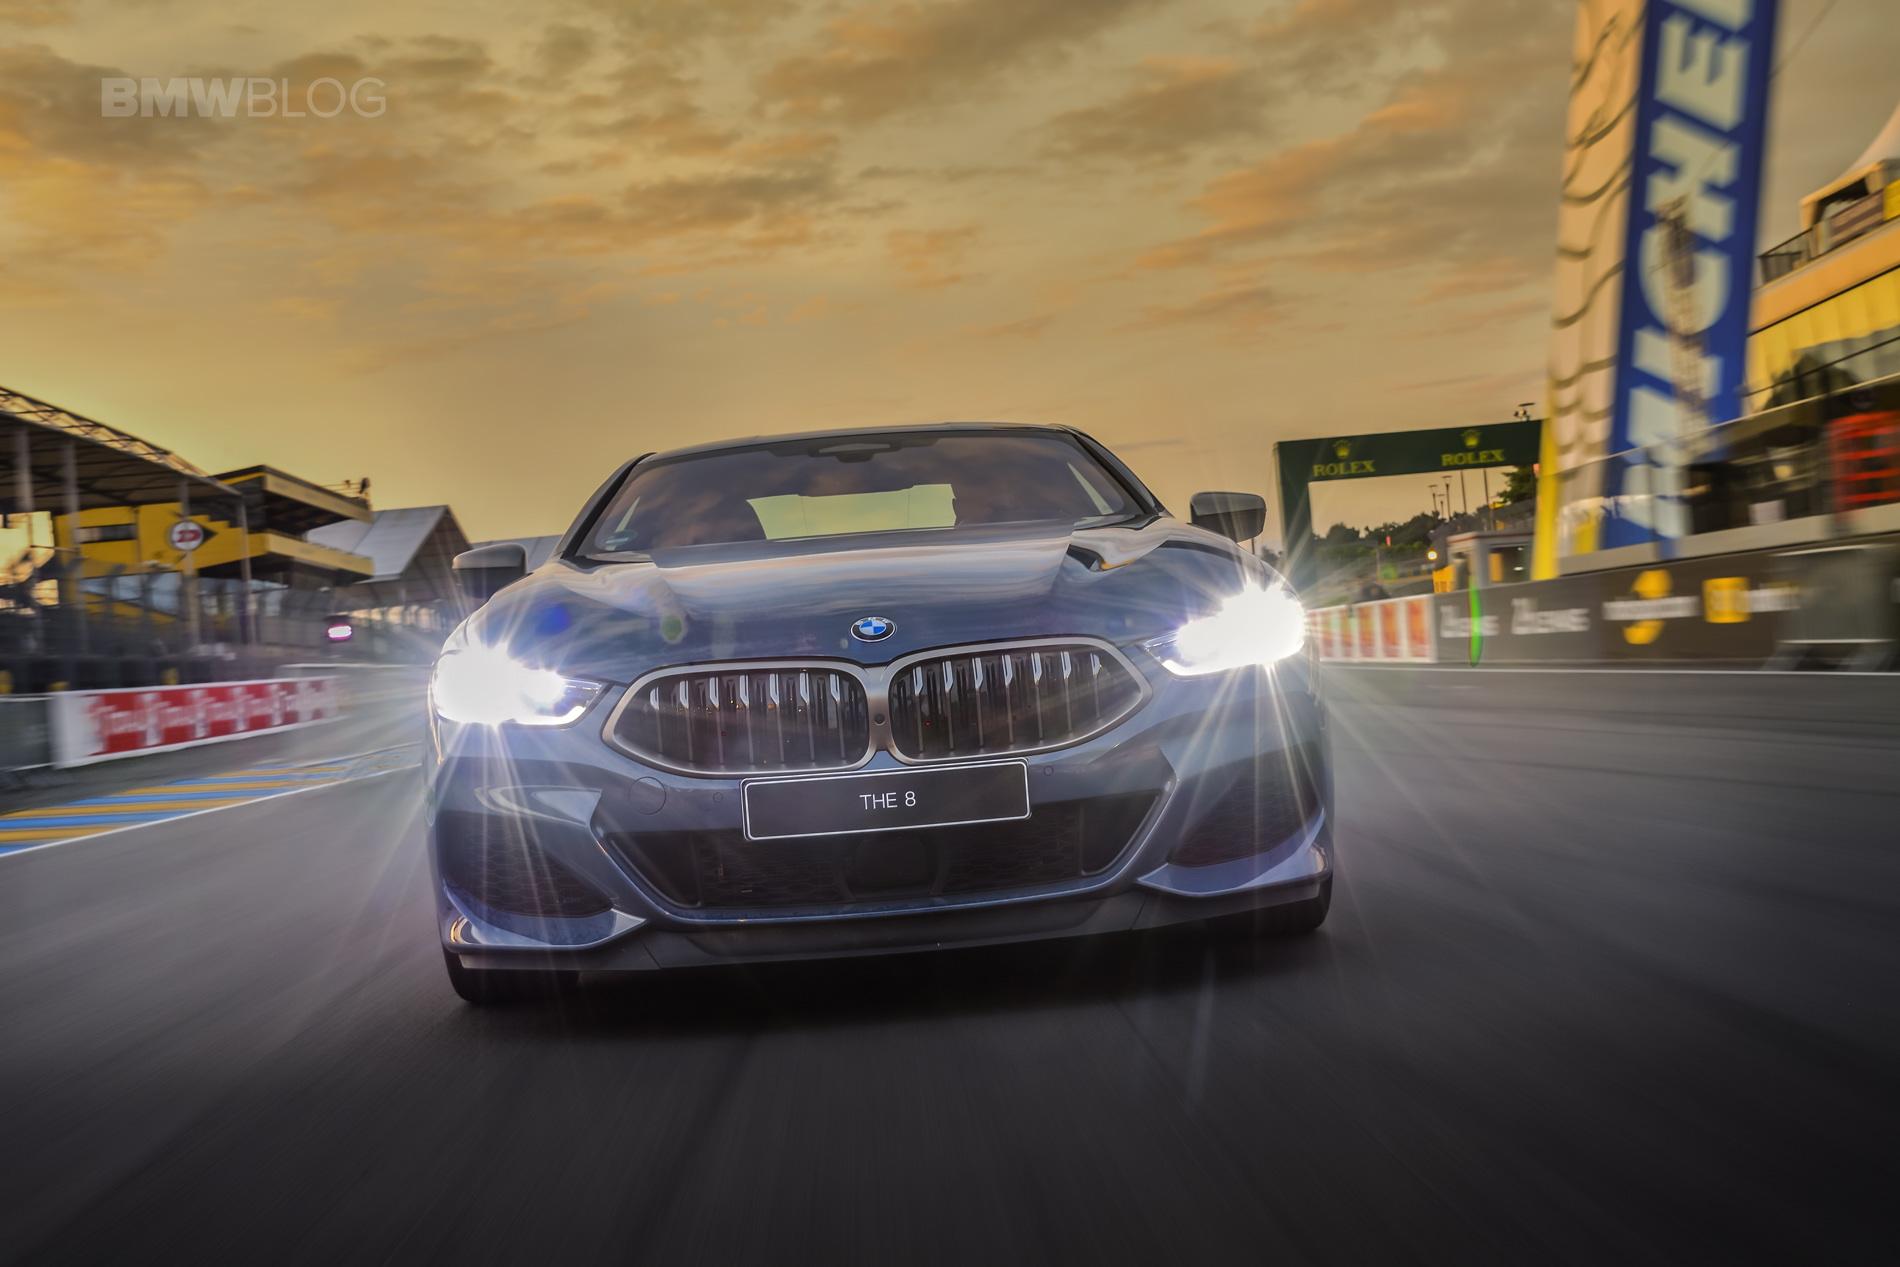 BMW 8 Series track Le mans 2018 12